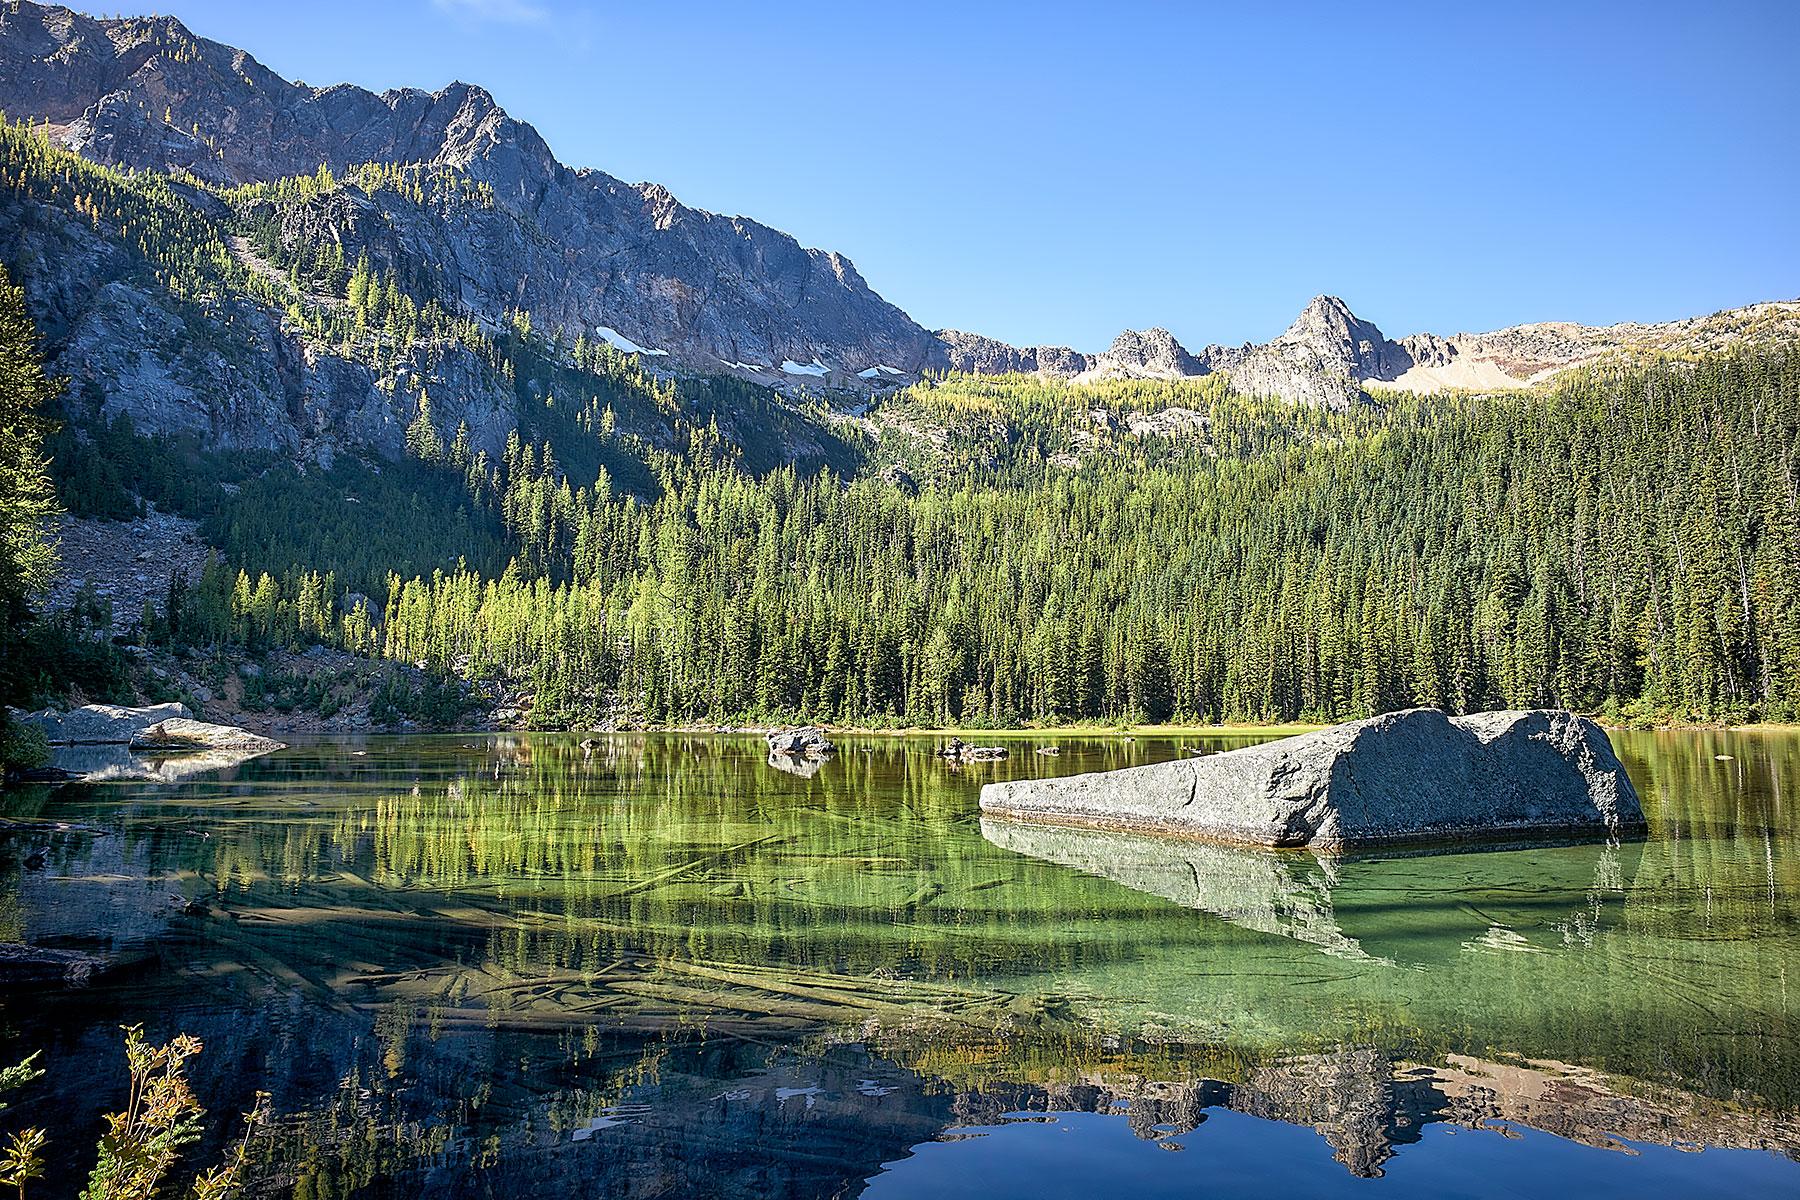 Cutthroat Lake, Washington © johncameron.ca